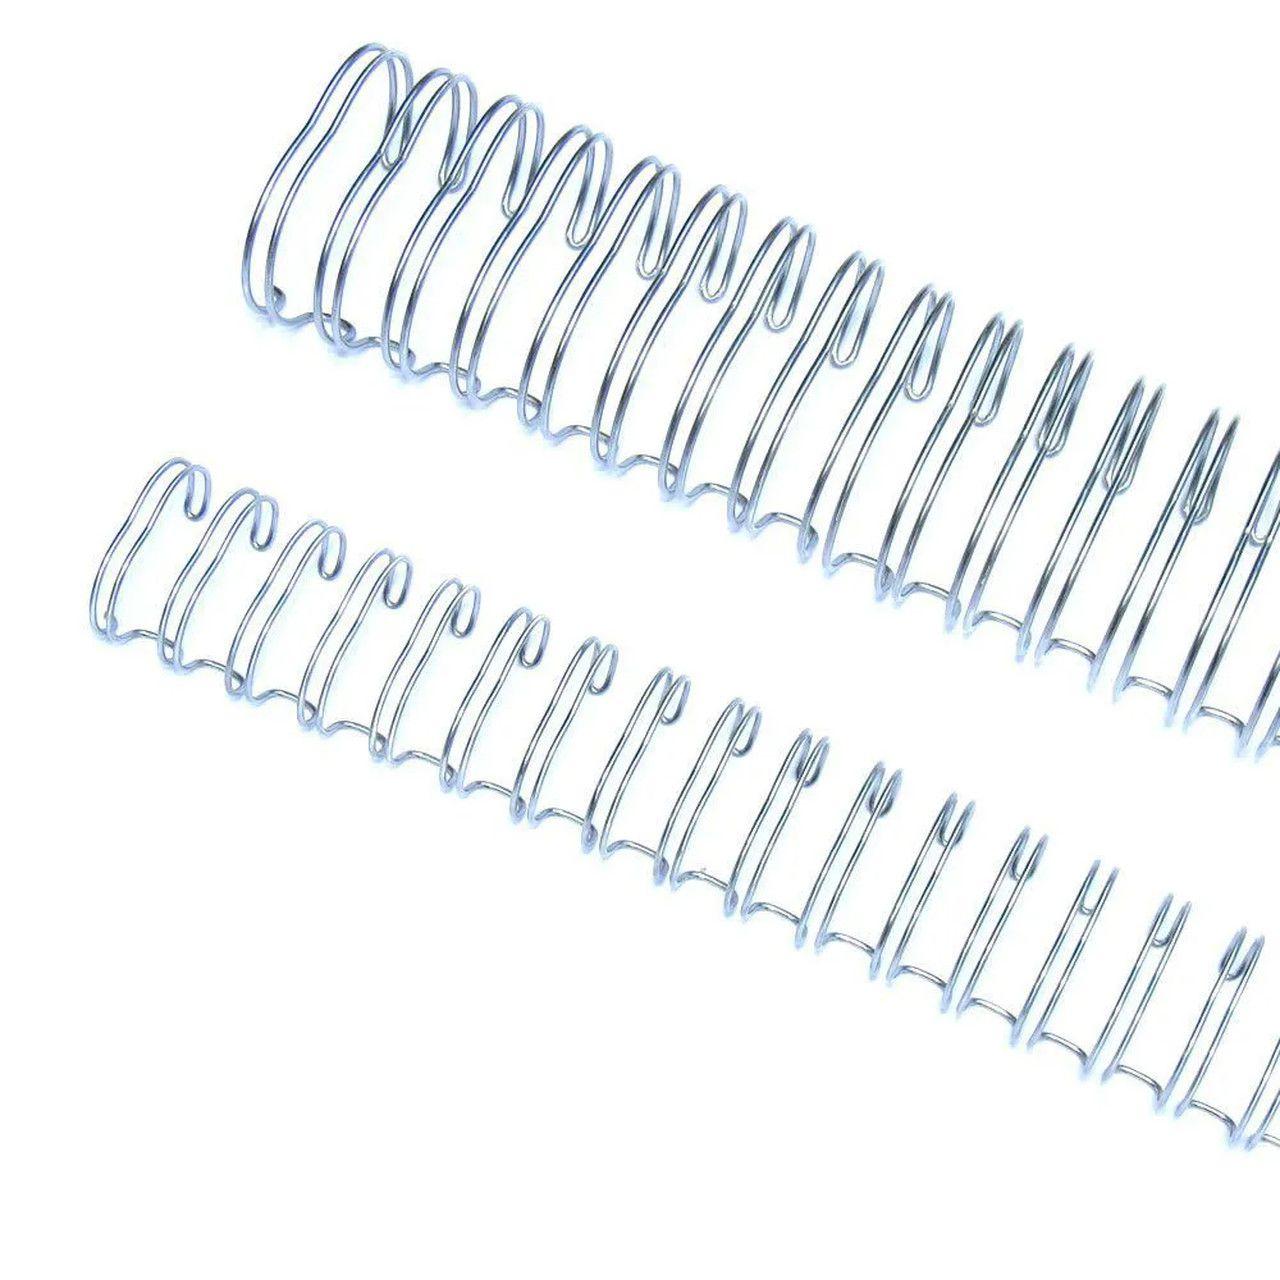 "Wire-o 1""1/4 para 270 fls Carta 2x1 Prata(Silver) 25 und"